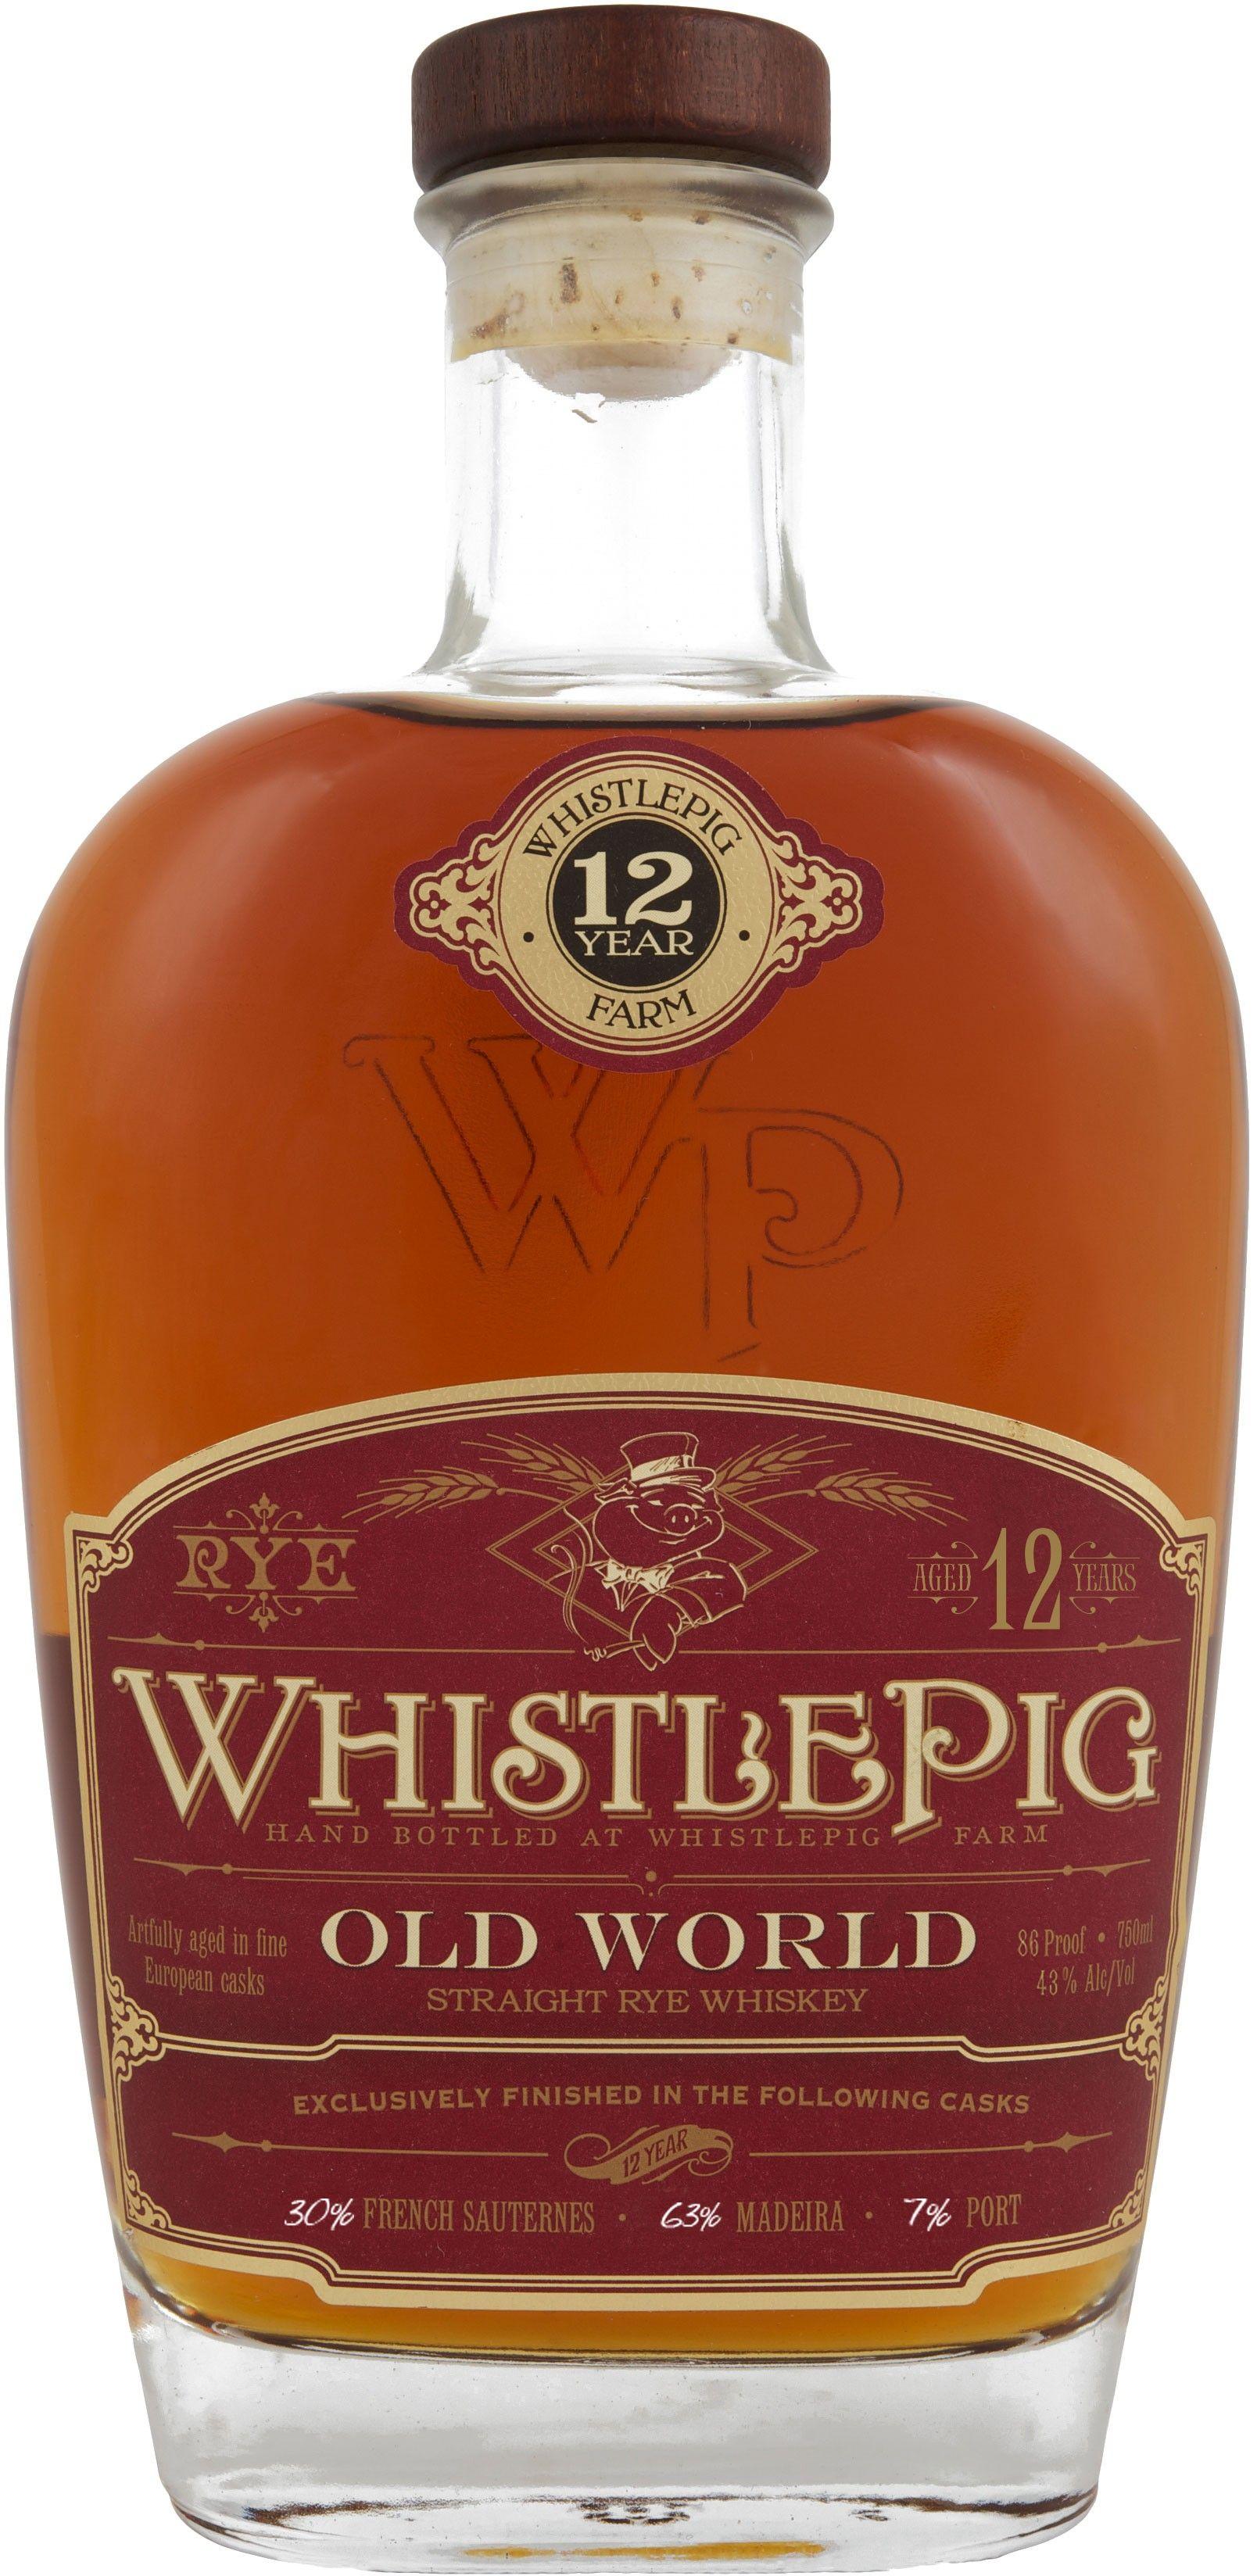 Whistlepig Old World 12 Year Old Straight Rye Whiskey Whiskey Rye Whiskey Wine Cask